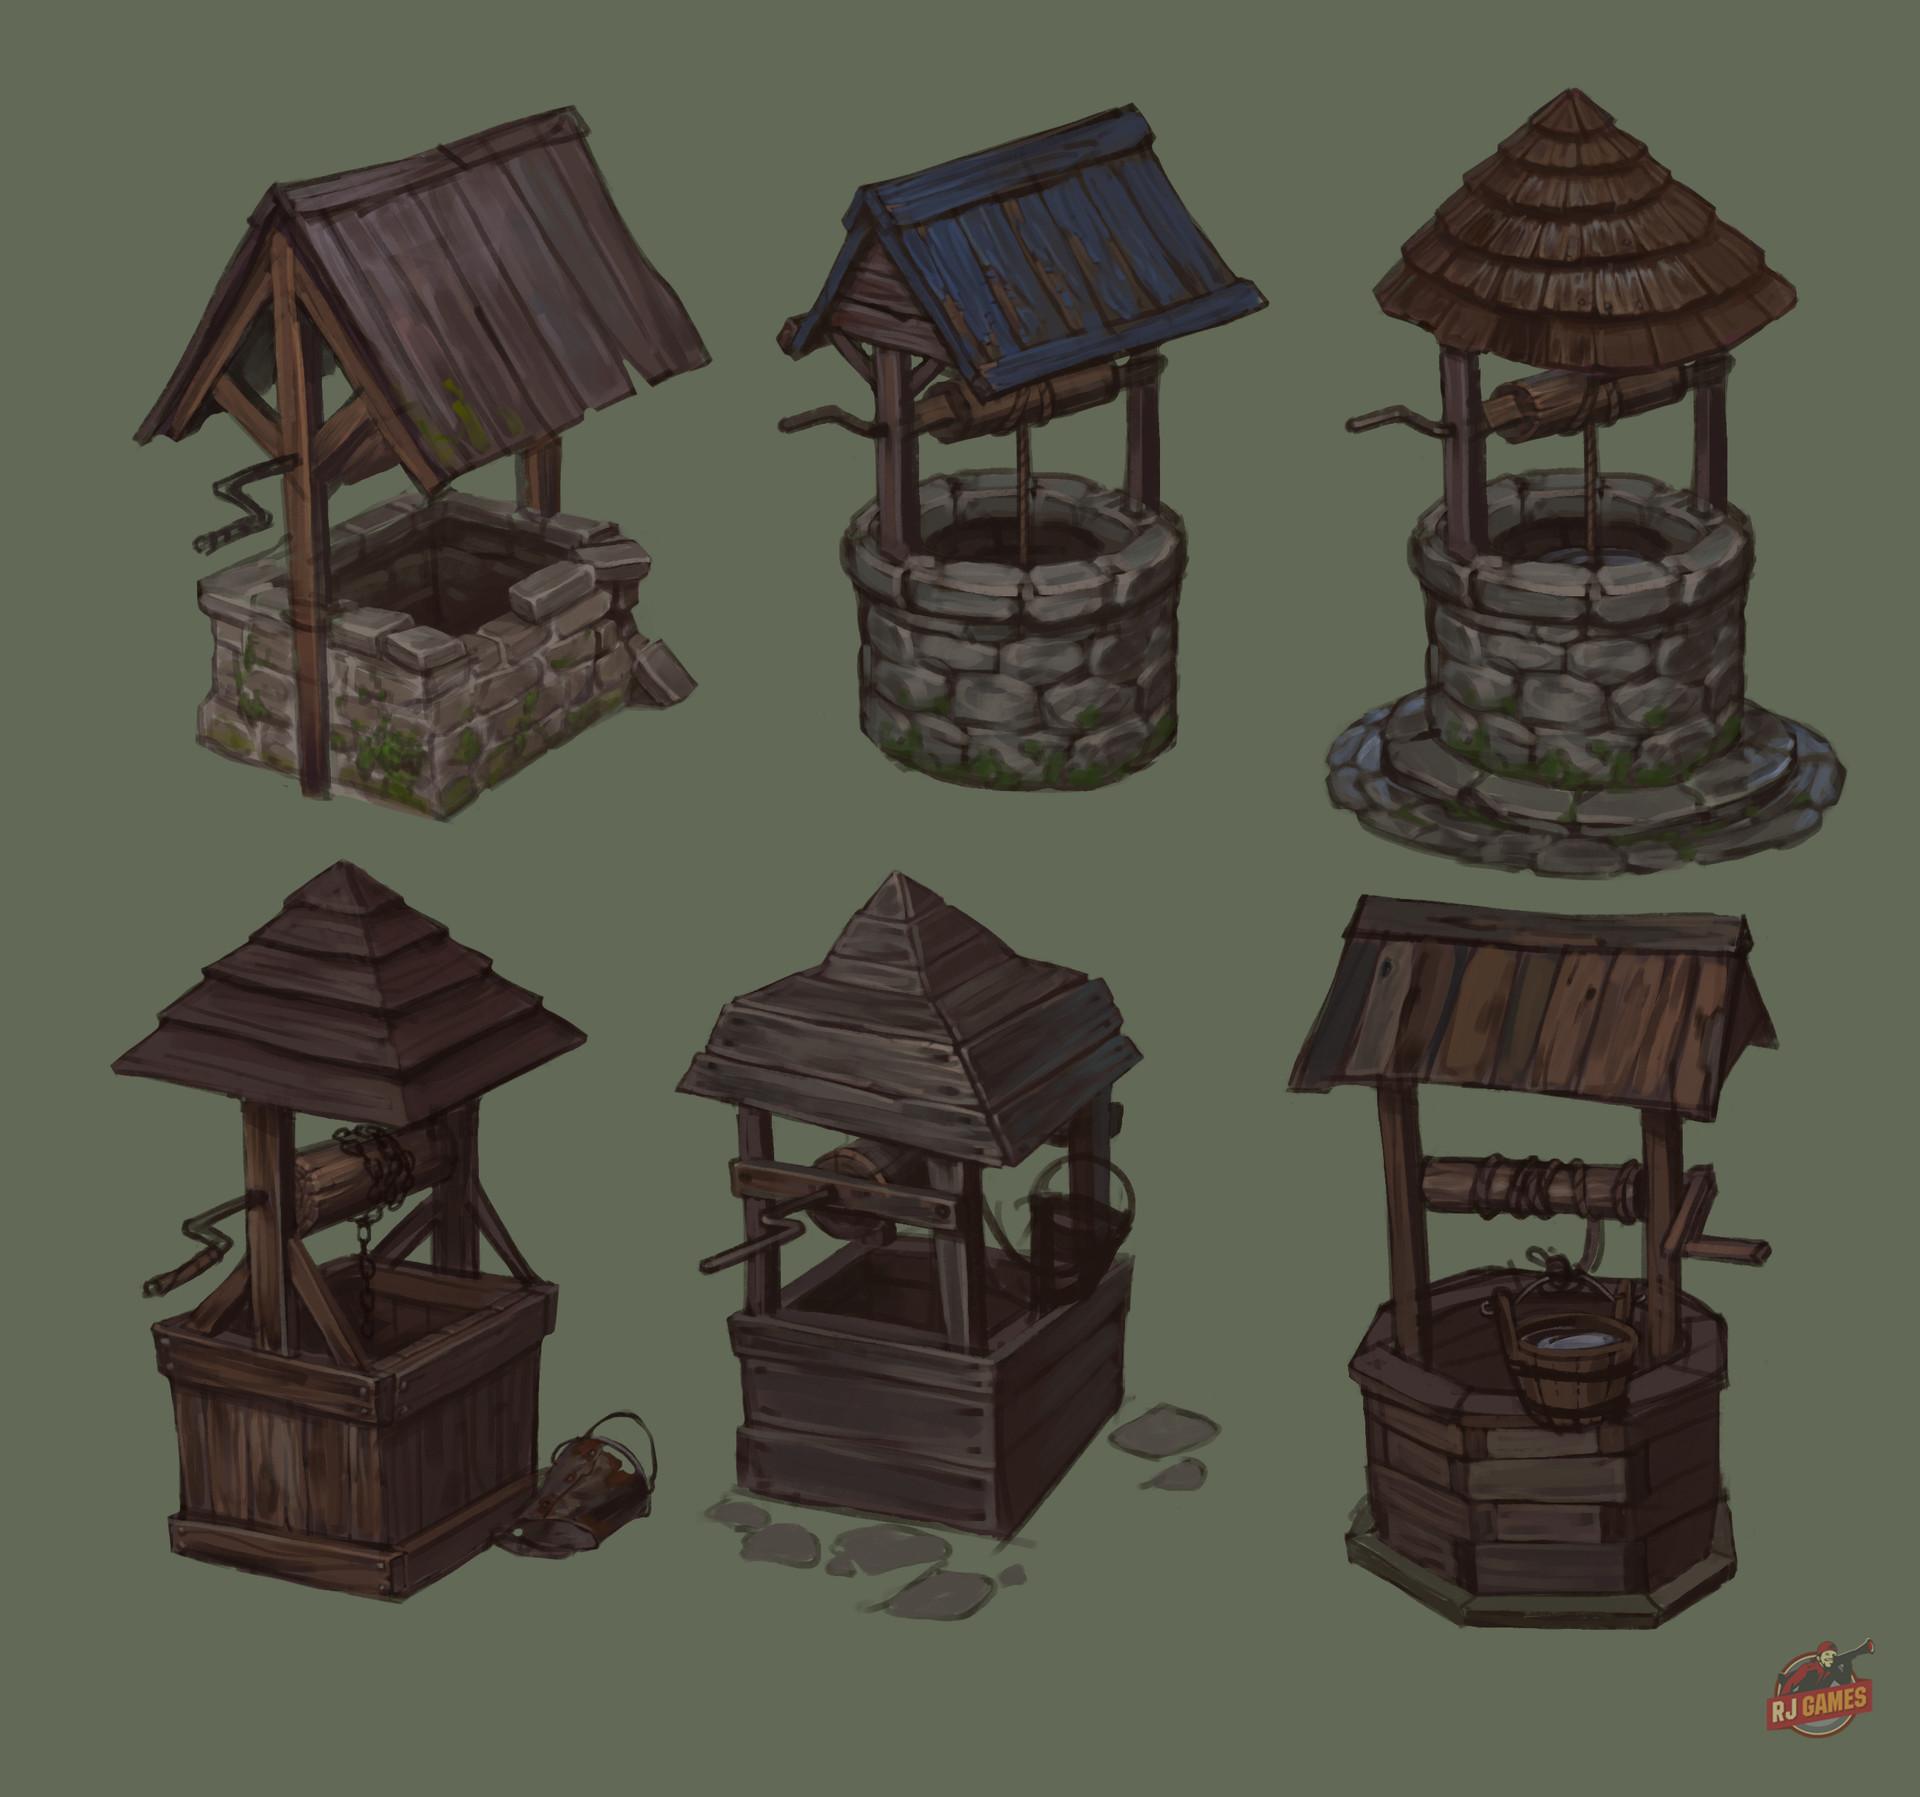 ArtStation - Entourage concepts, Alexander Bocharov